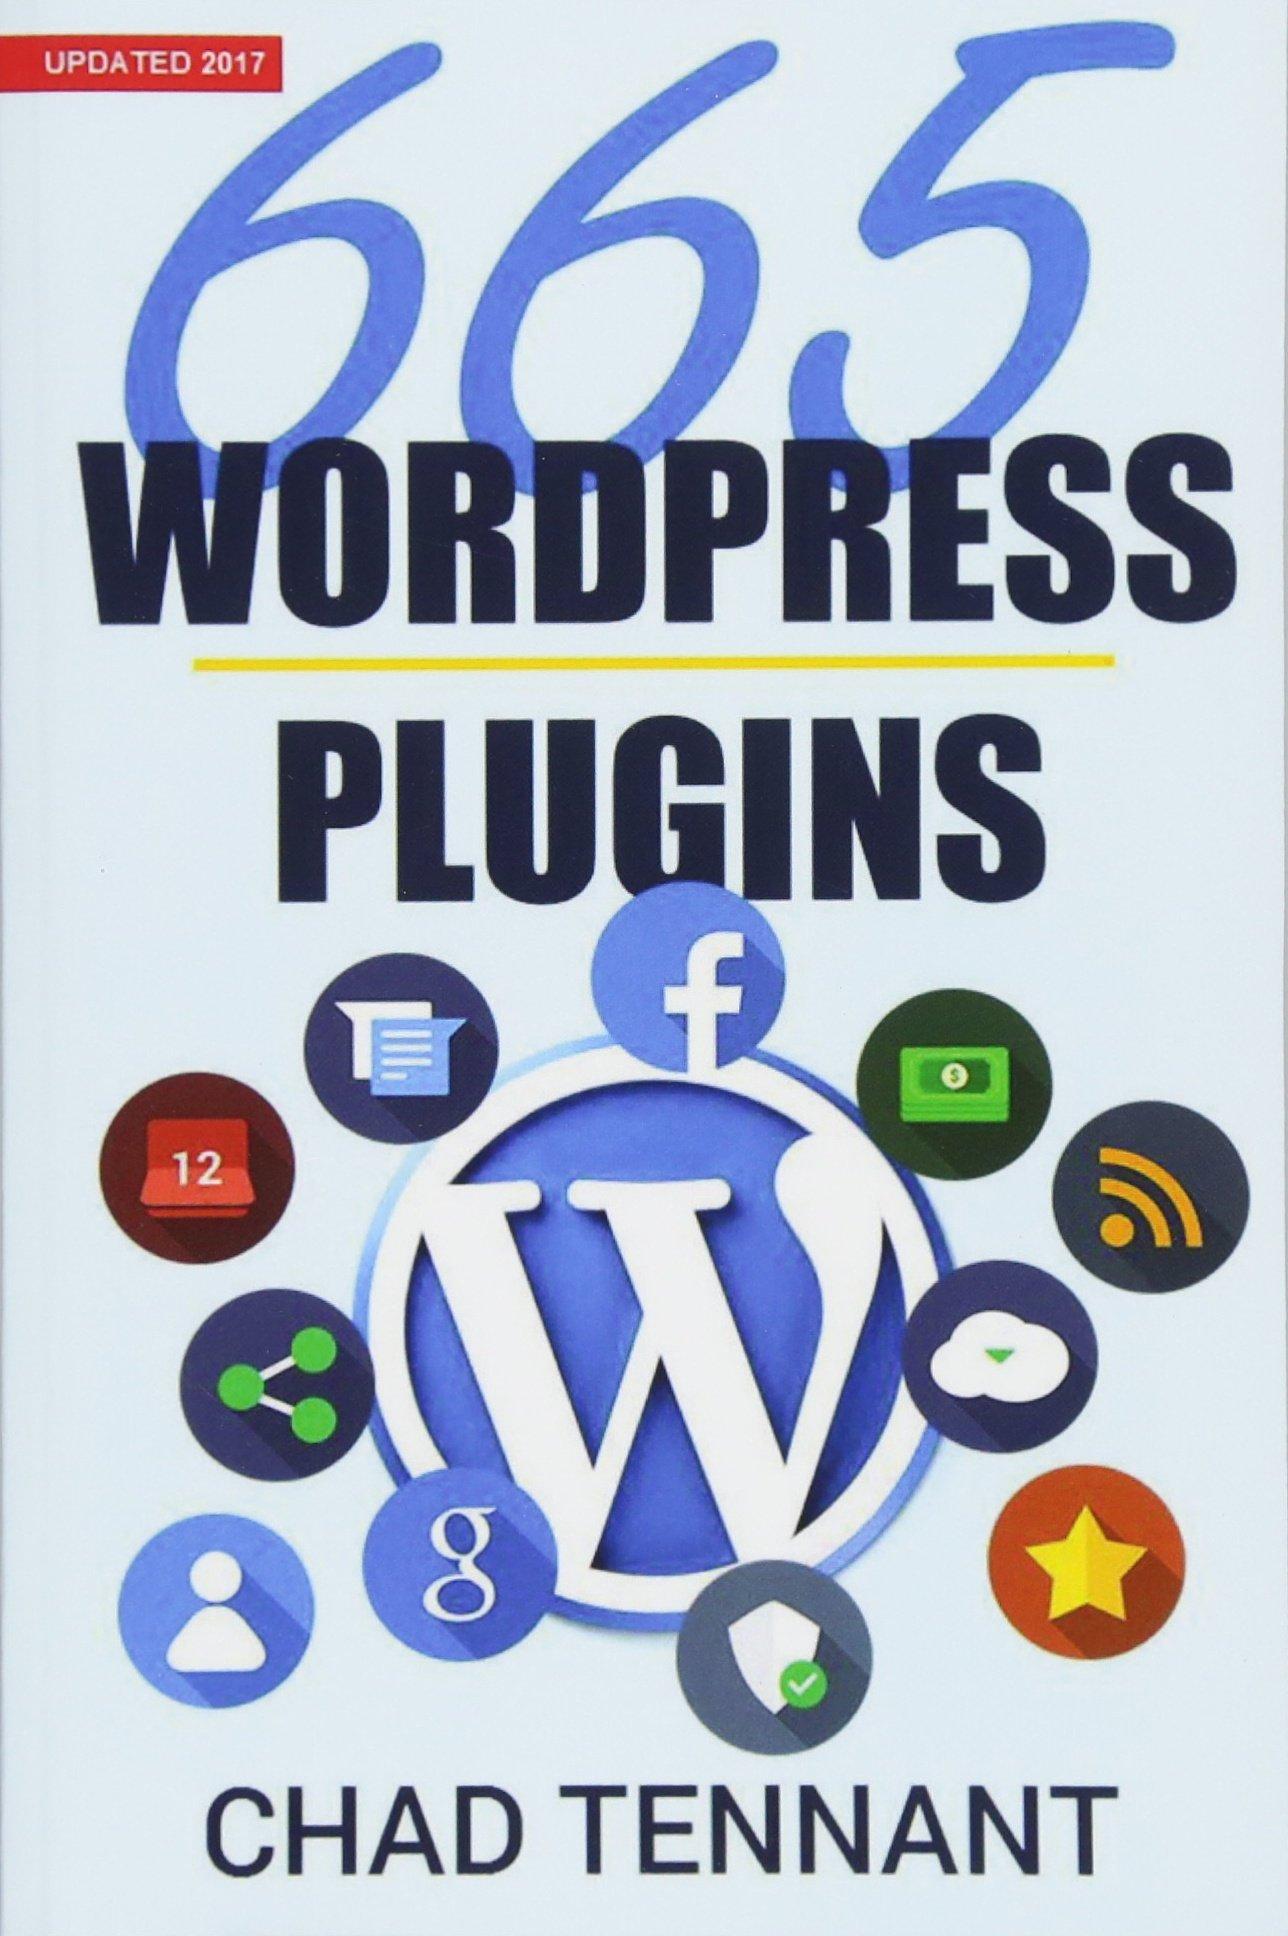 WordPress: 665 Free WordPress Plugins for Creating Amazing and Profitable Websites pdf